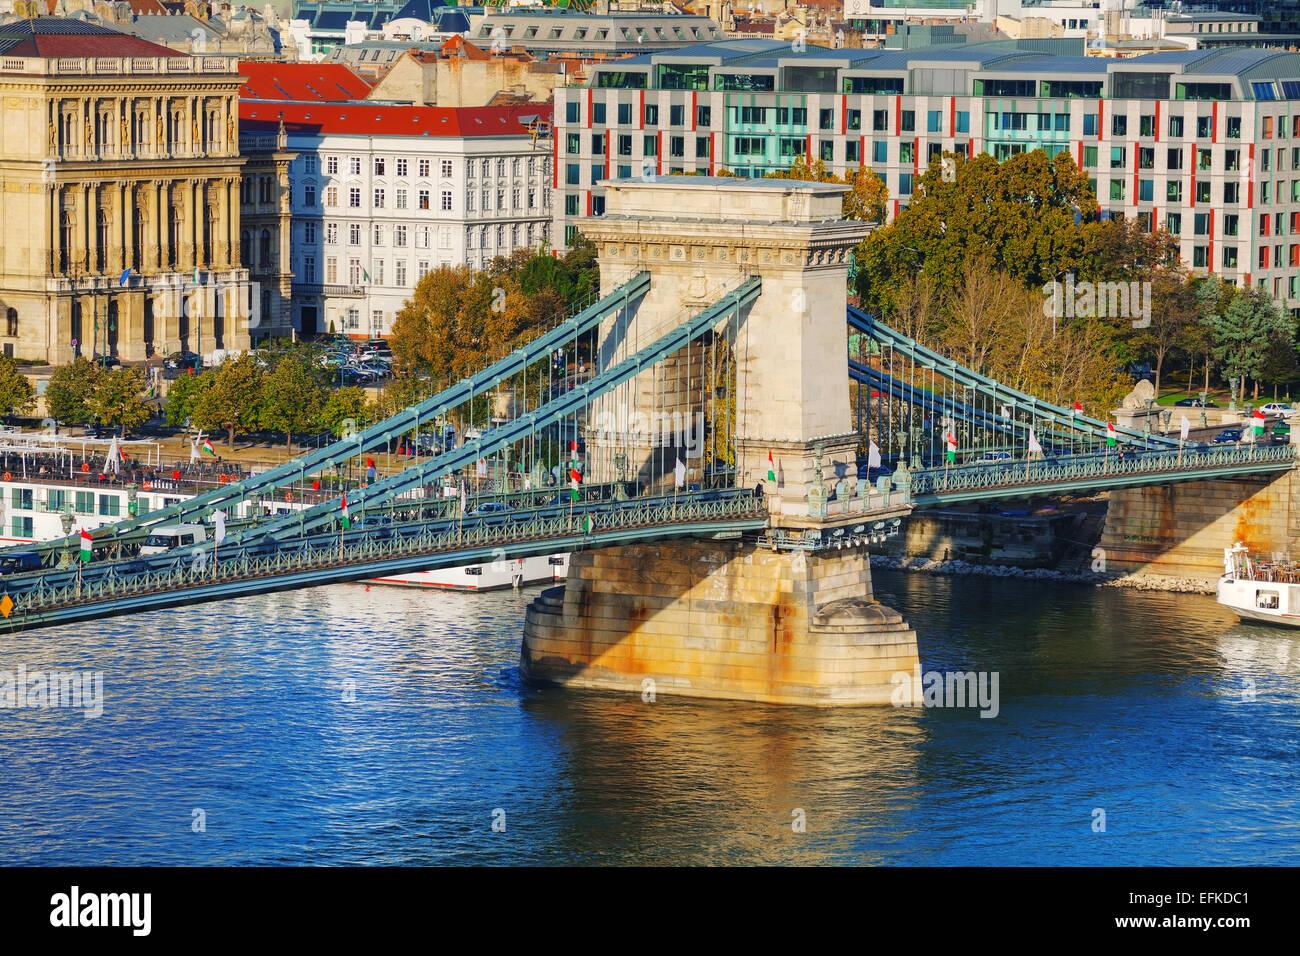 The Szechenyi Chain Bridge in Budapest, Hungary - Stock Image